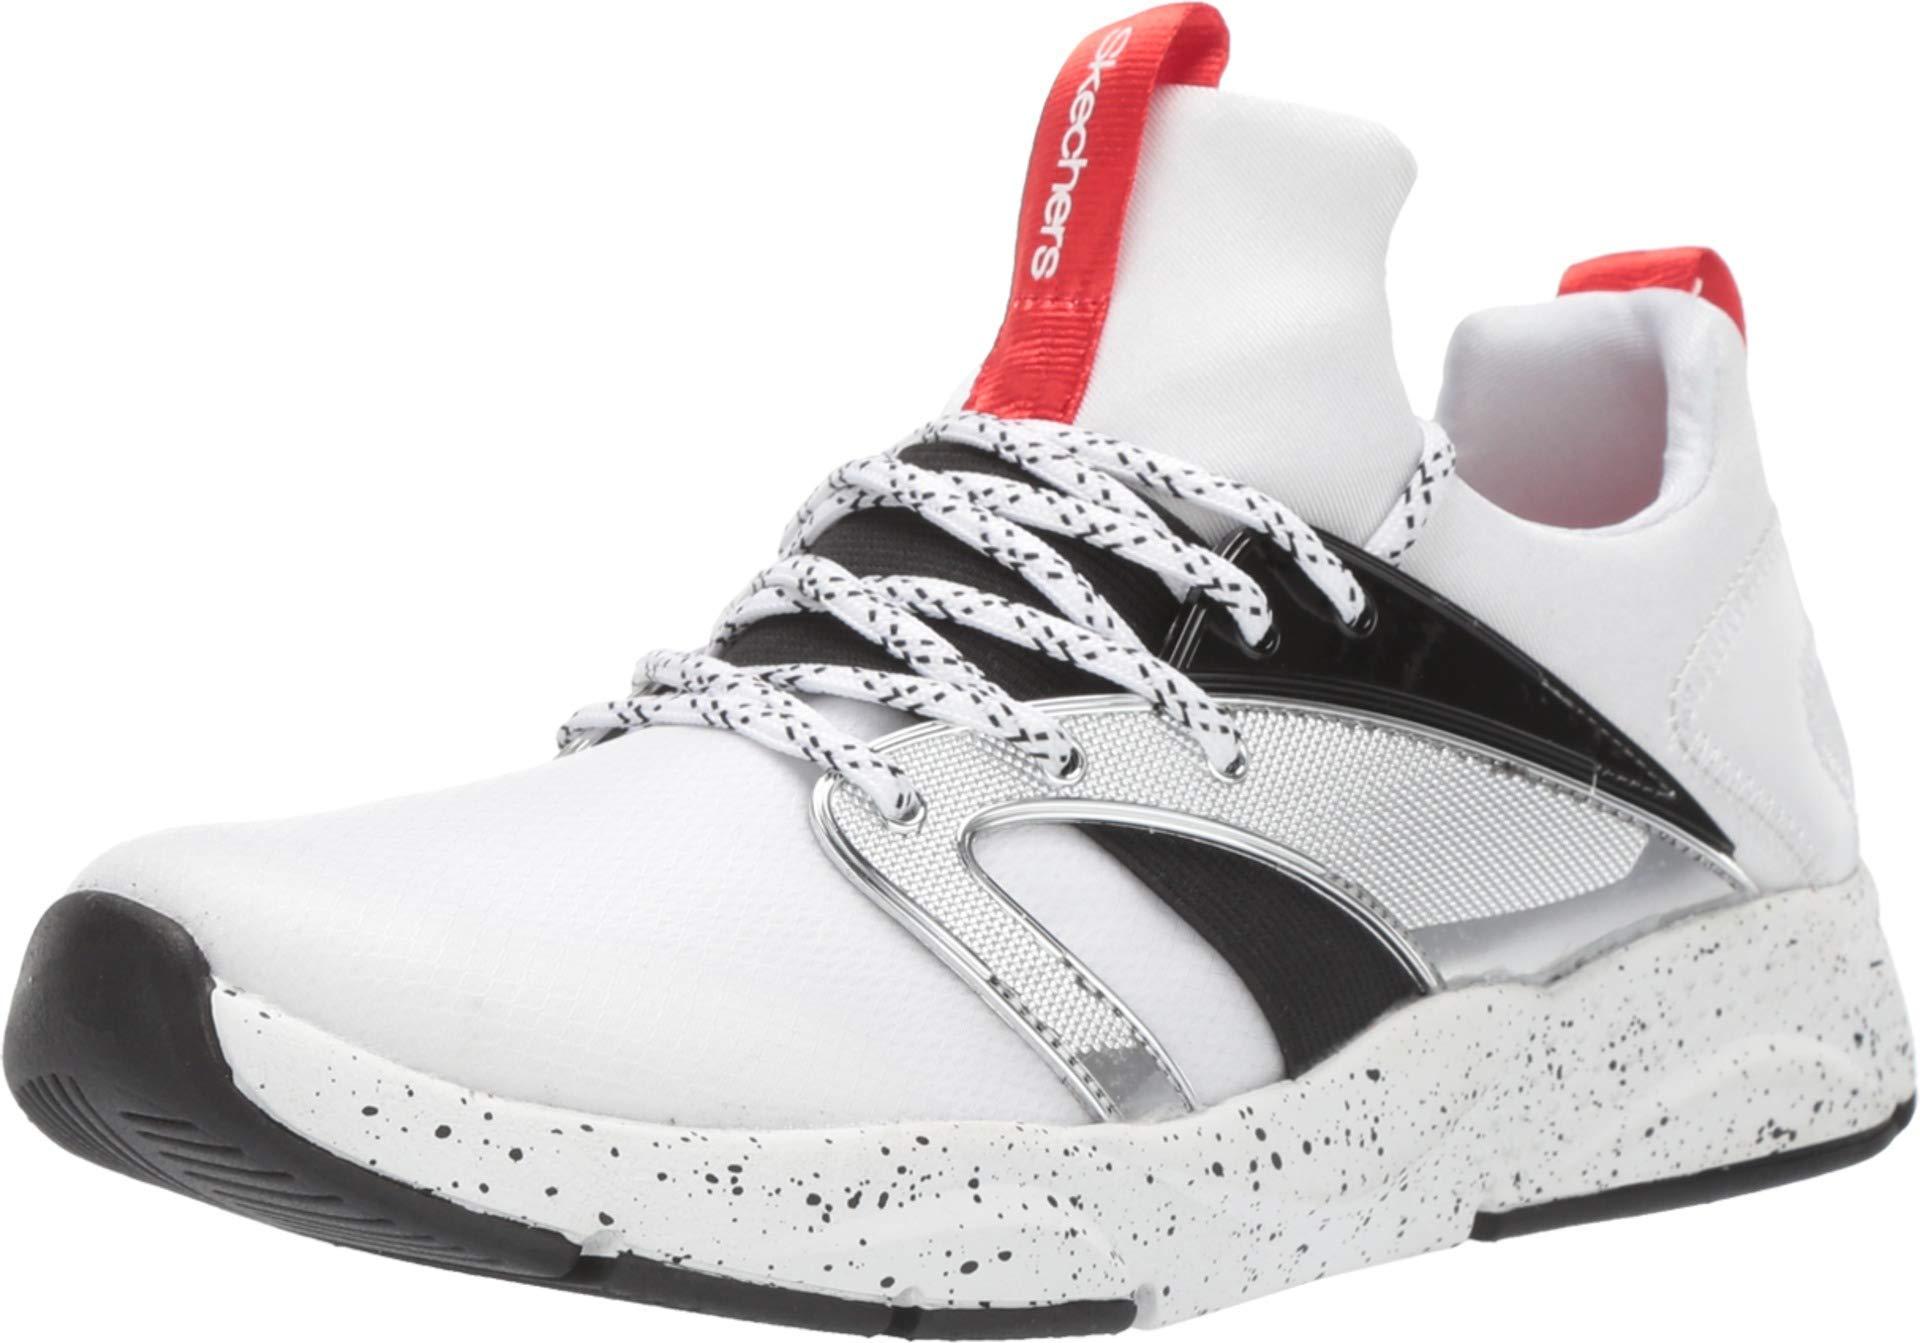 ویکالا · خرید  اصل اورجینال · خرید از آمازون · Skechers Kids Girls' Shine Status Sneaker, White/Black/Red, 4 Medium US Big Kid wekala · ویکالا